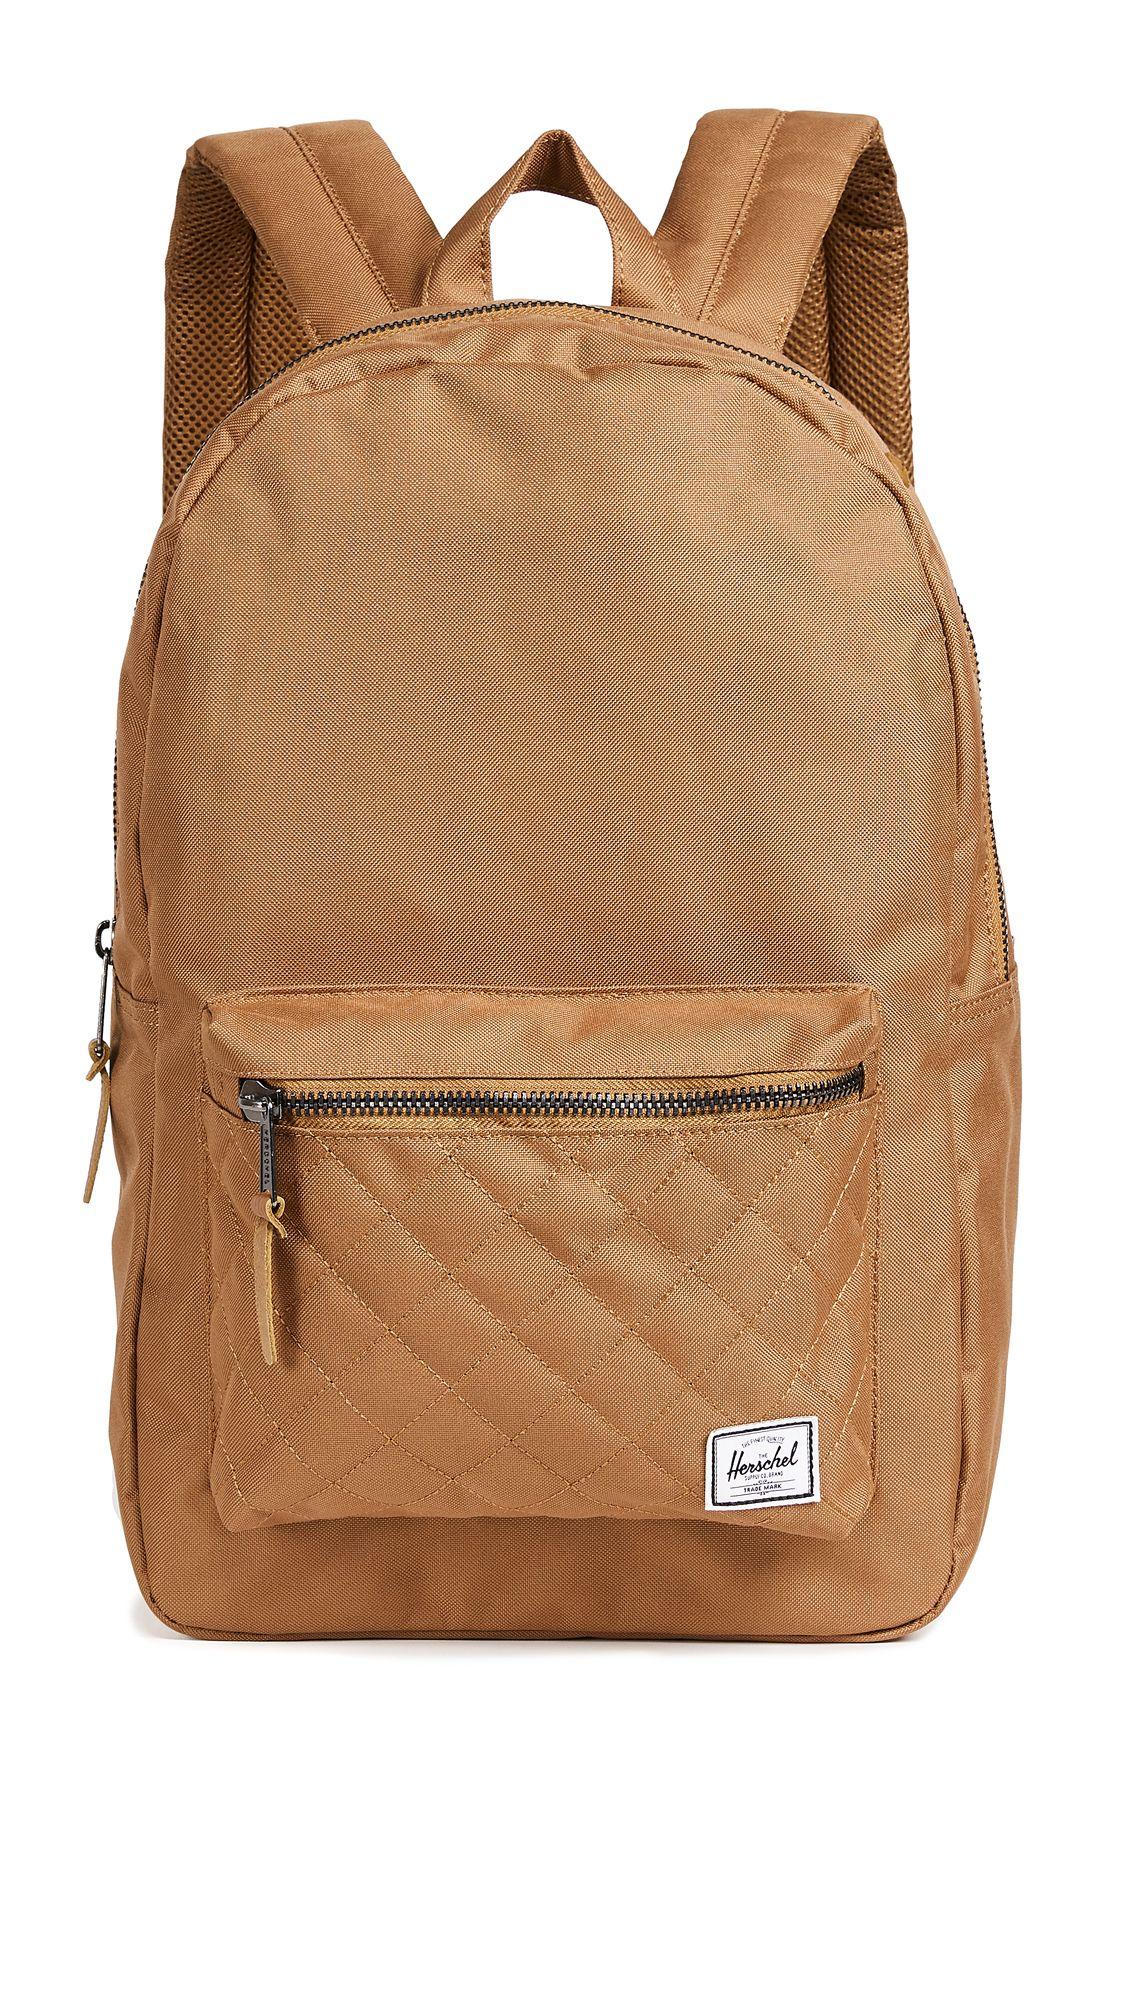 5fd6ce1f83 HERSCHEL SUPPLY CO. QUILTED SETTLEMENT BACKPACK.  herschelsupplyco.  bags   backpacks